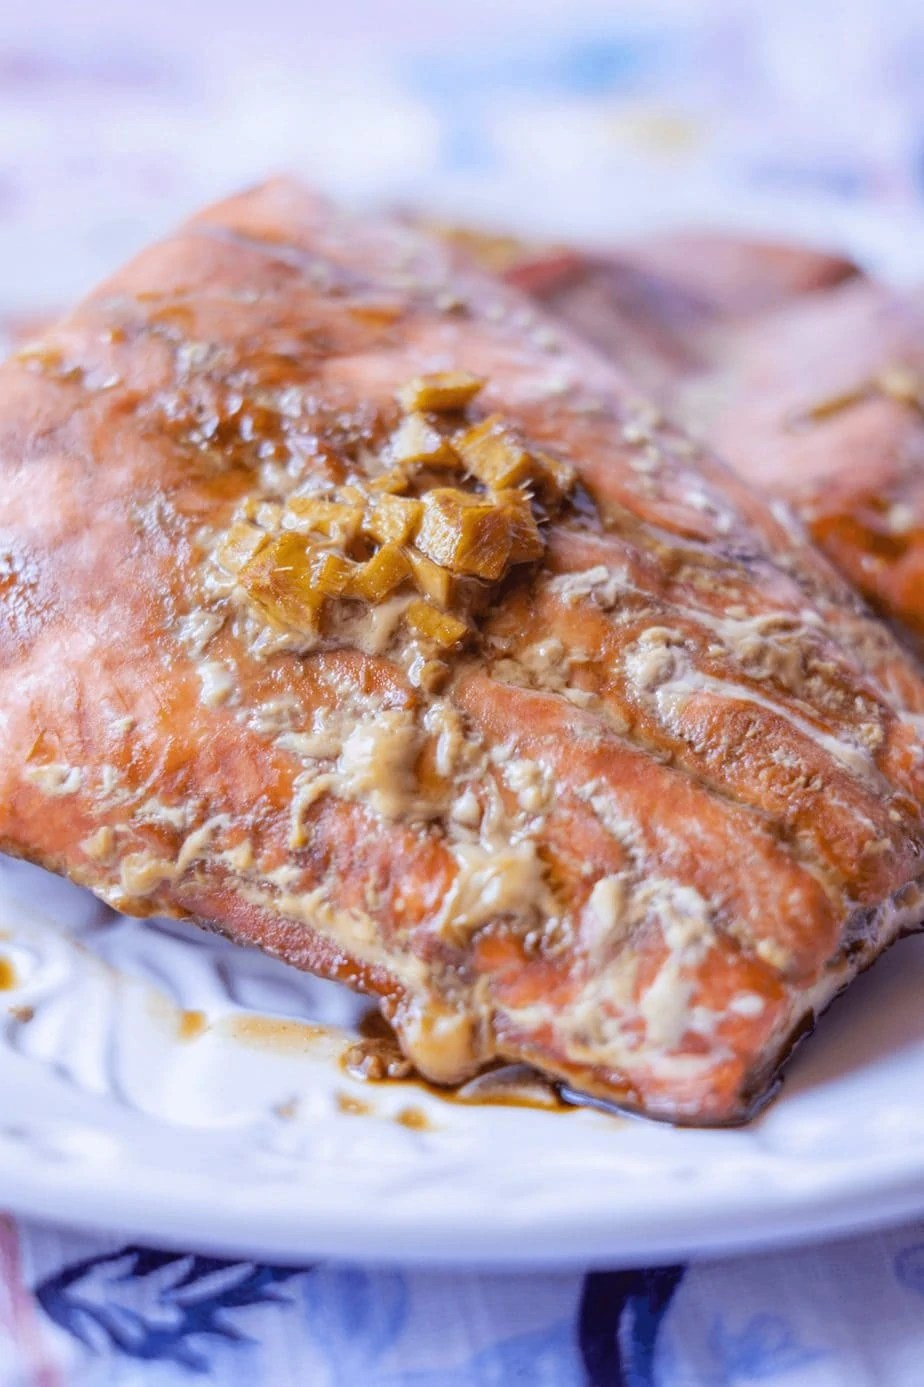 Paleo Teriyaki Salmon #whatsavvysaid #paleodinner #paleorecipe